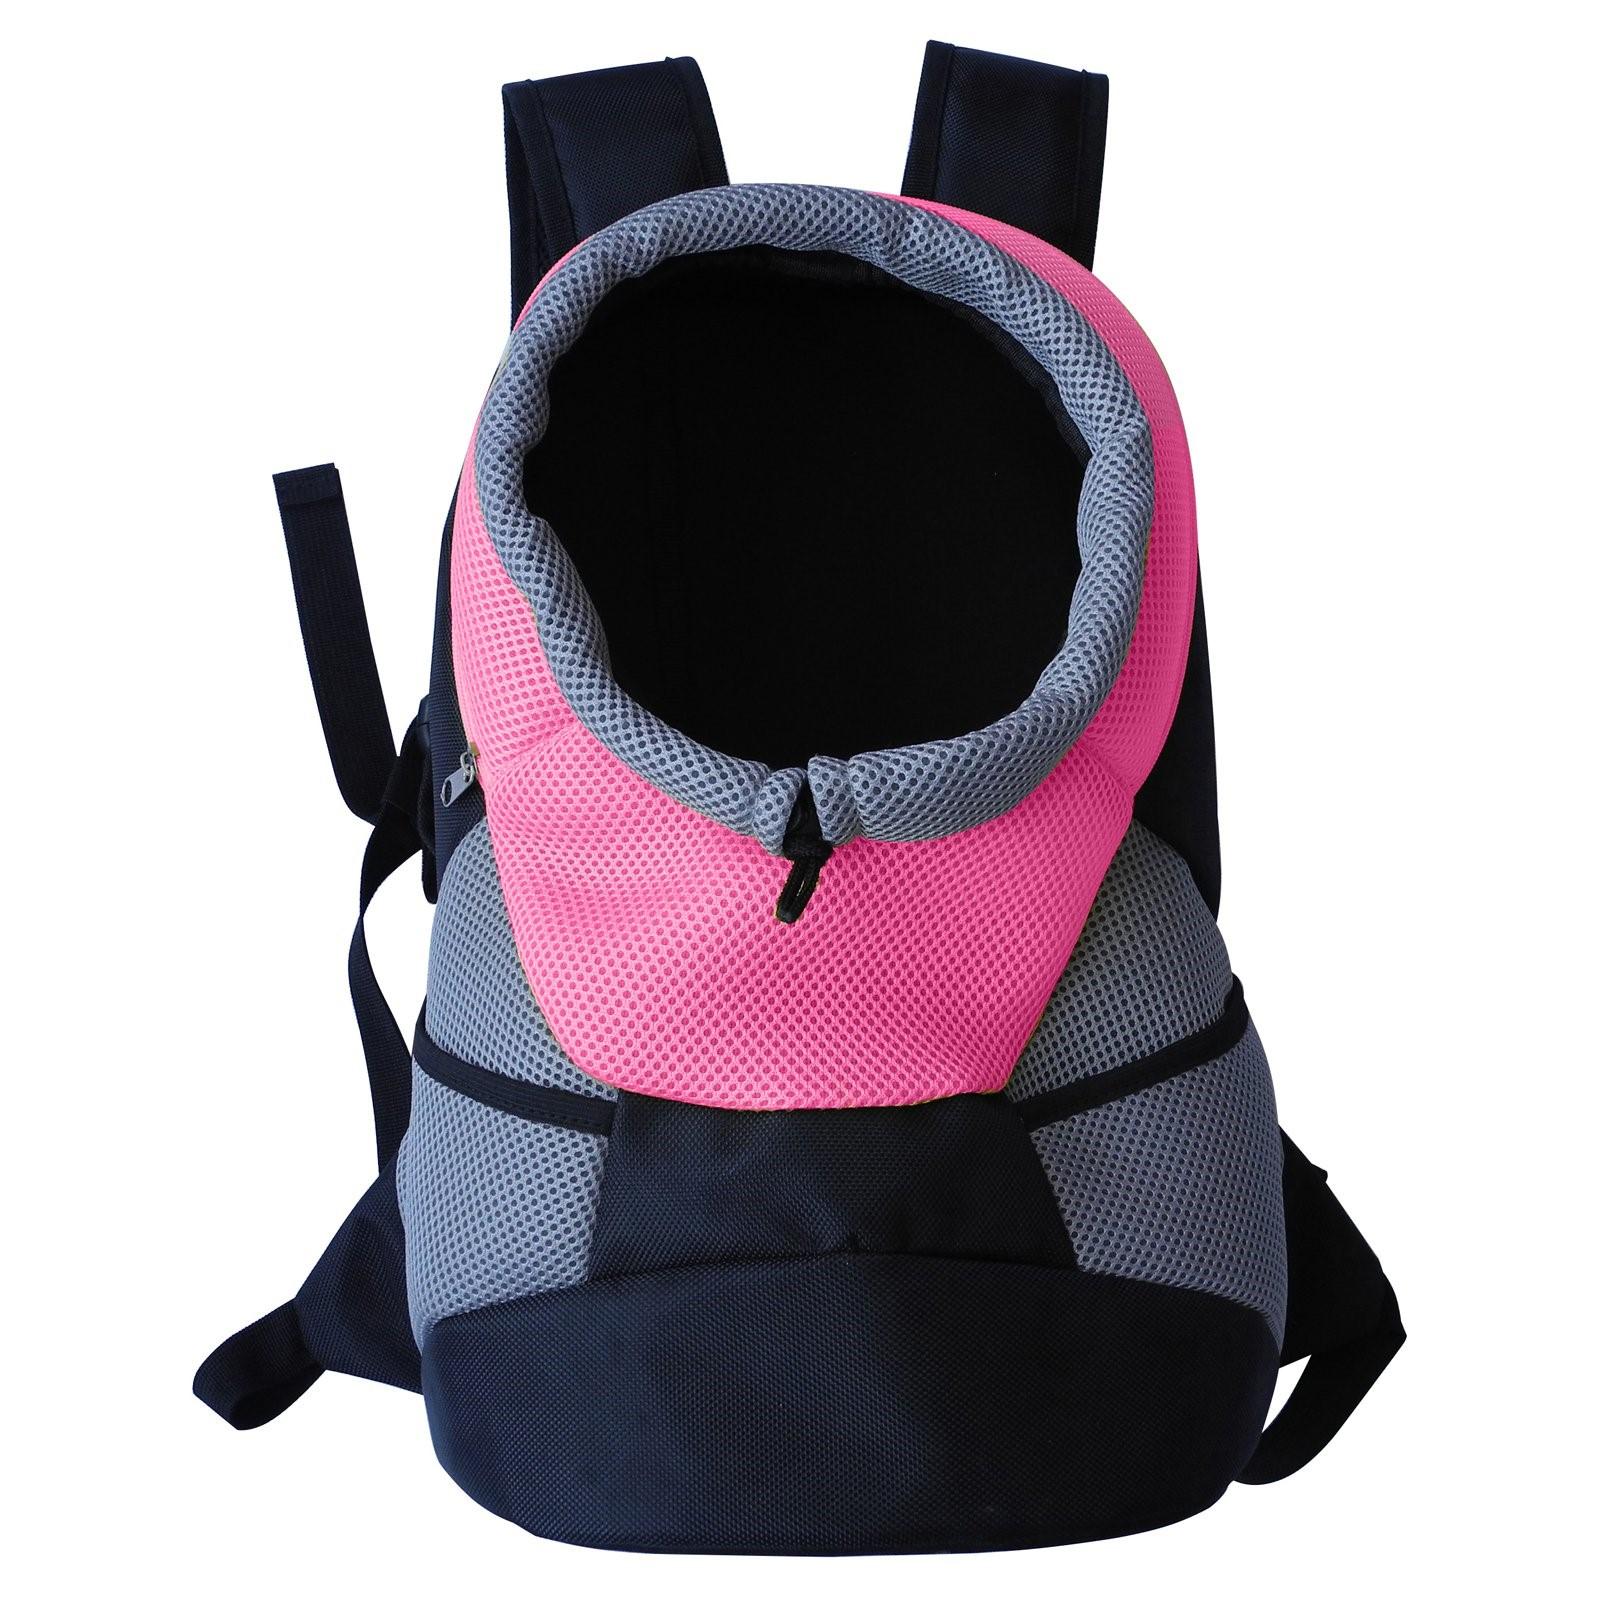 Pet Life On-the-Go Supreme Travel Bark-Pack Backpack Pet Carrier